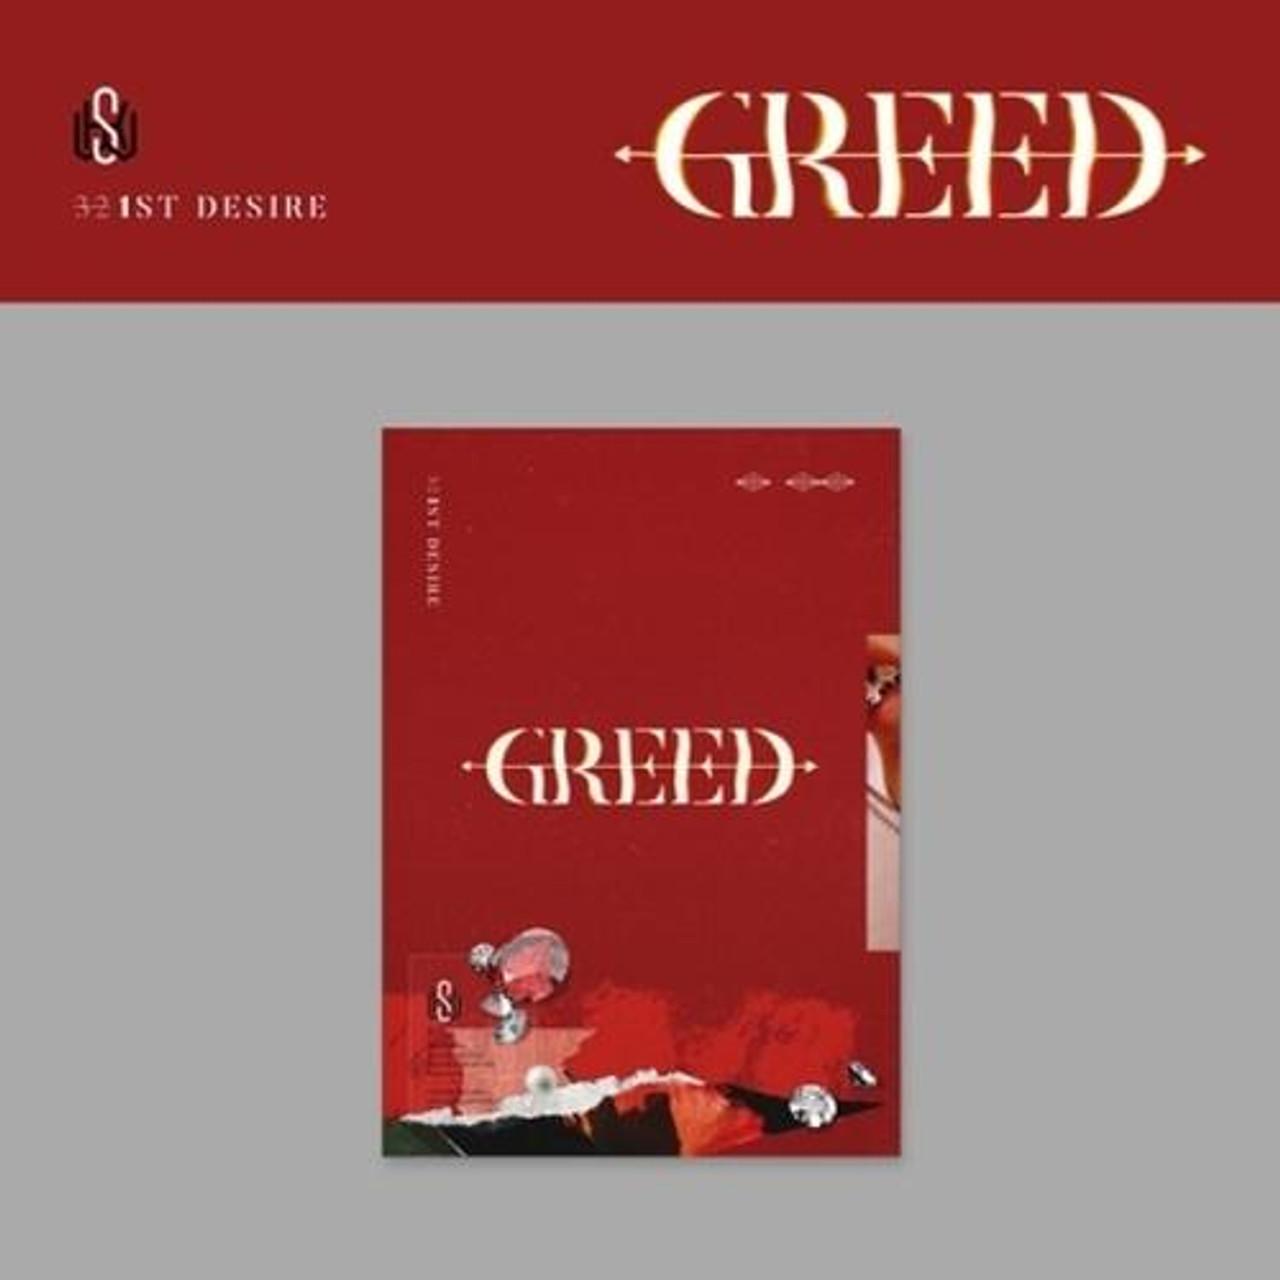 KIM WOO SEOK - 1ST DESIRE [GREED] (S VER.)+ Poster